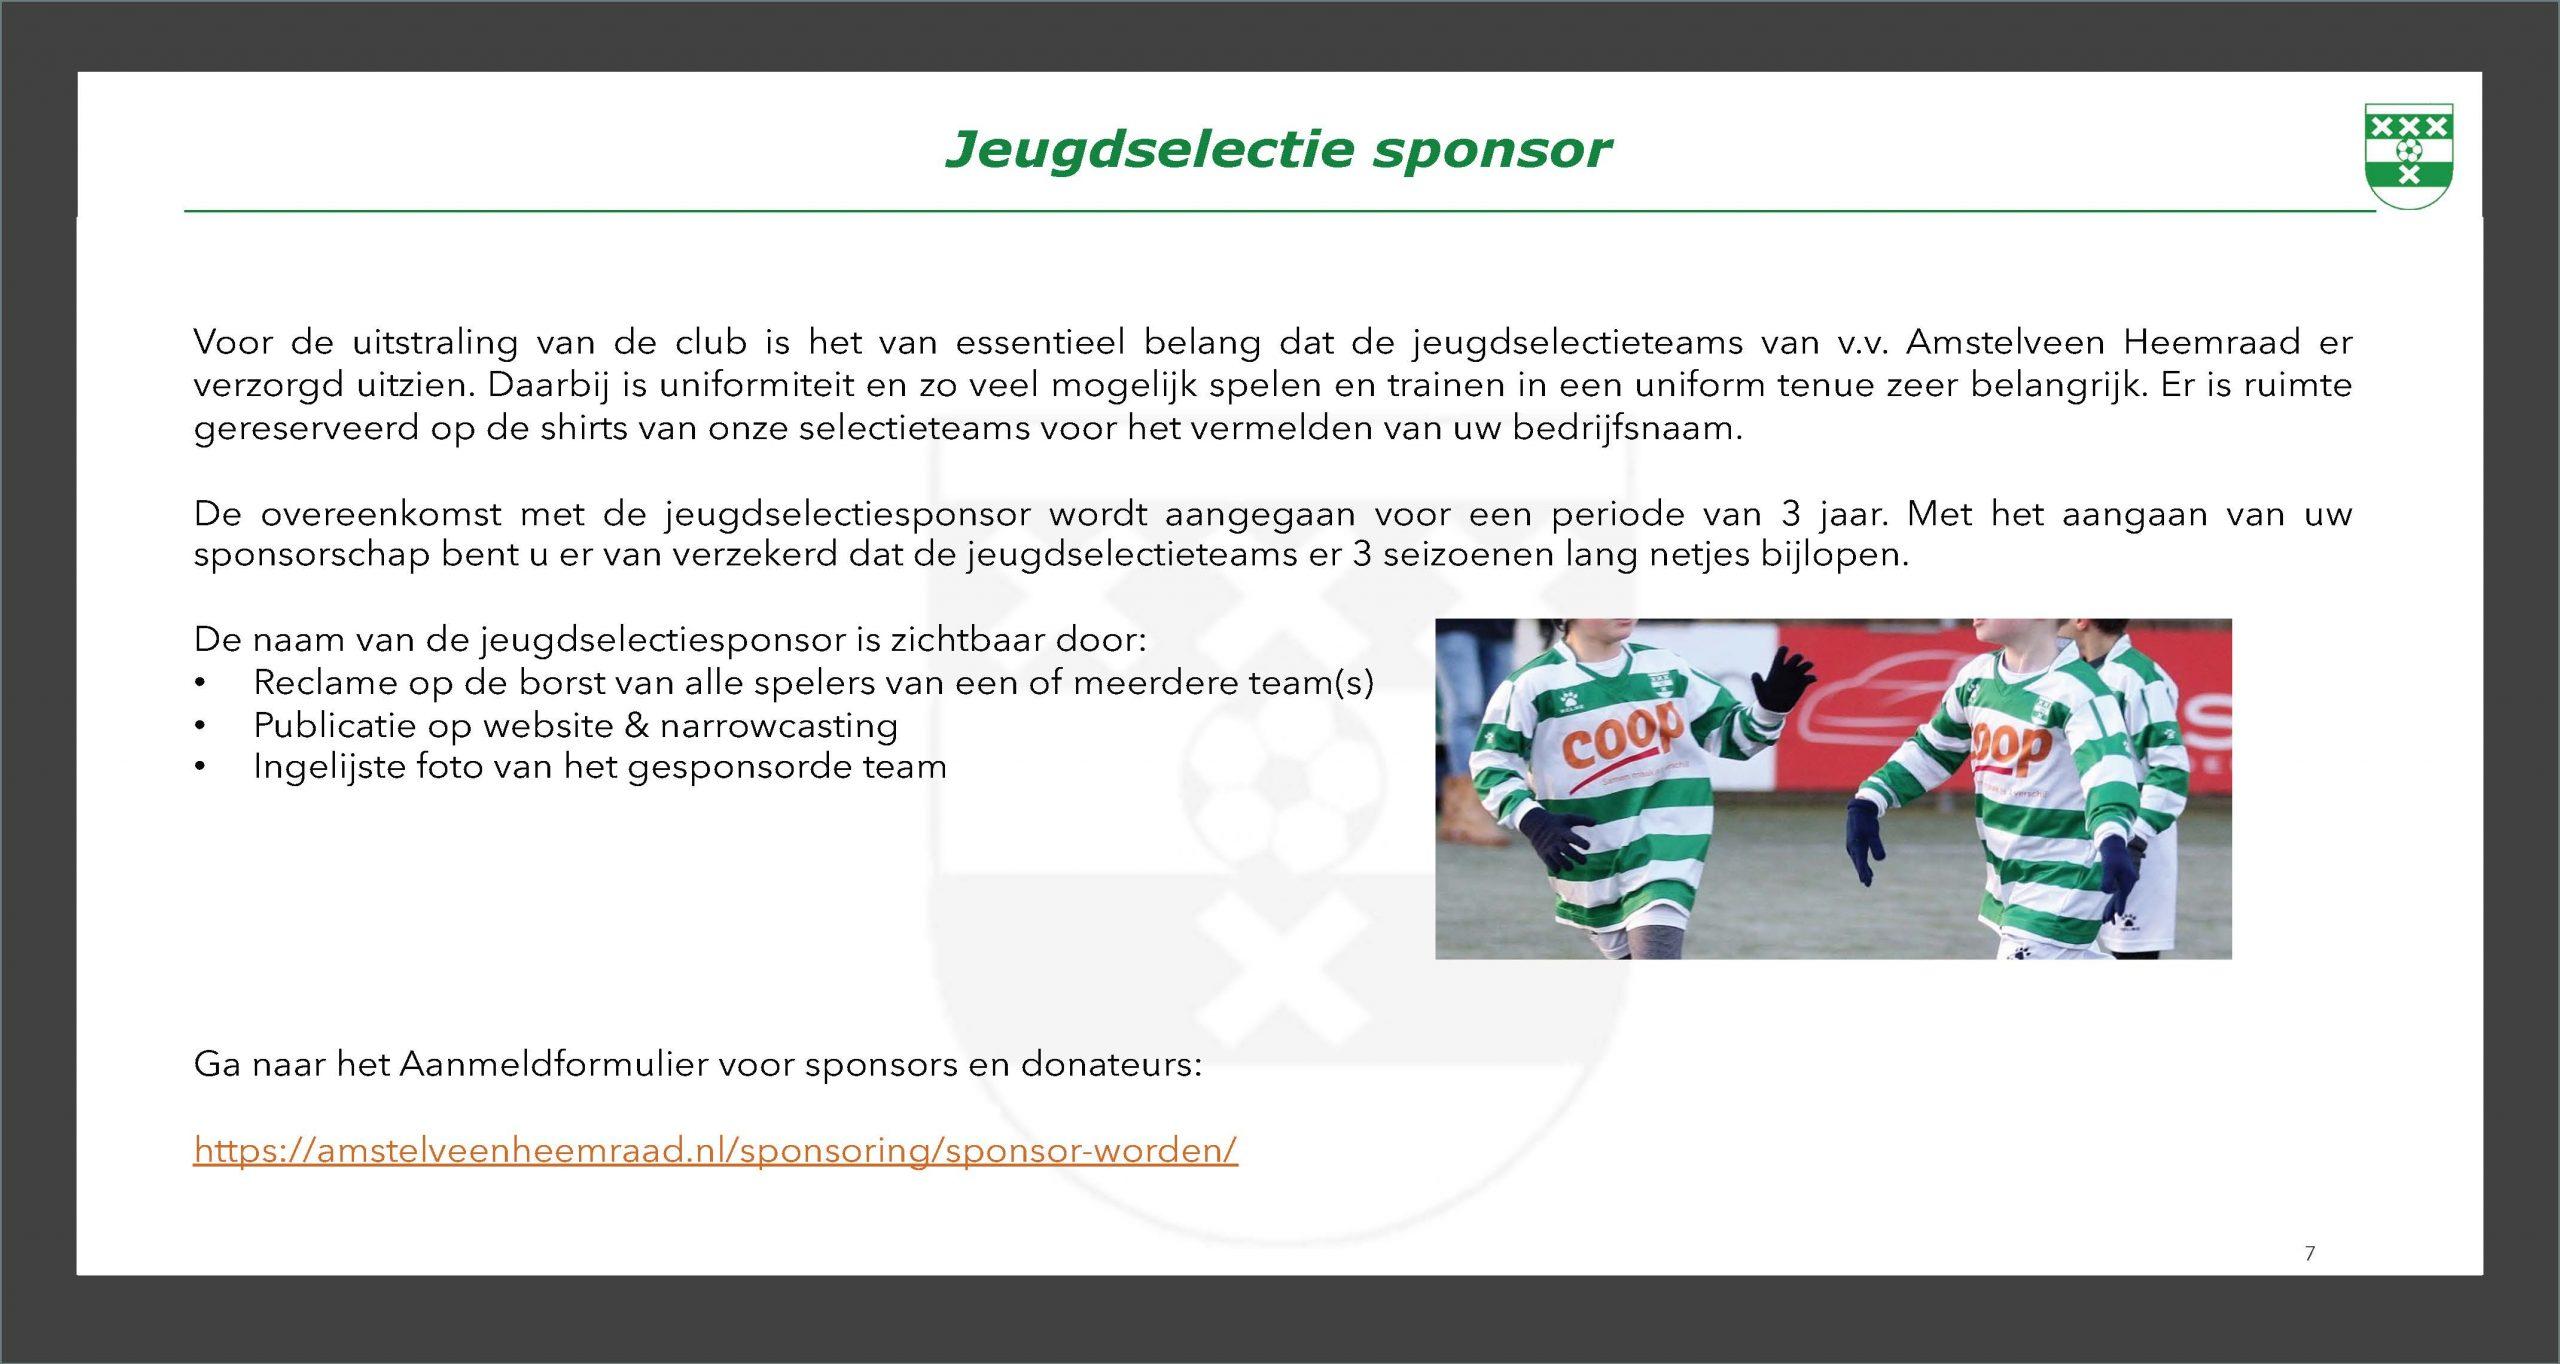 Sponsorplan 2020-2021 DEF_pagina7